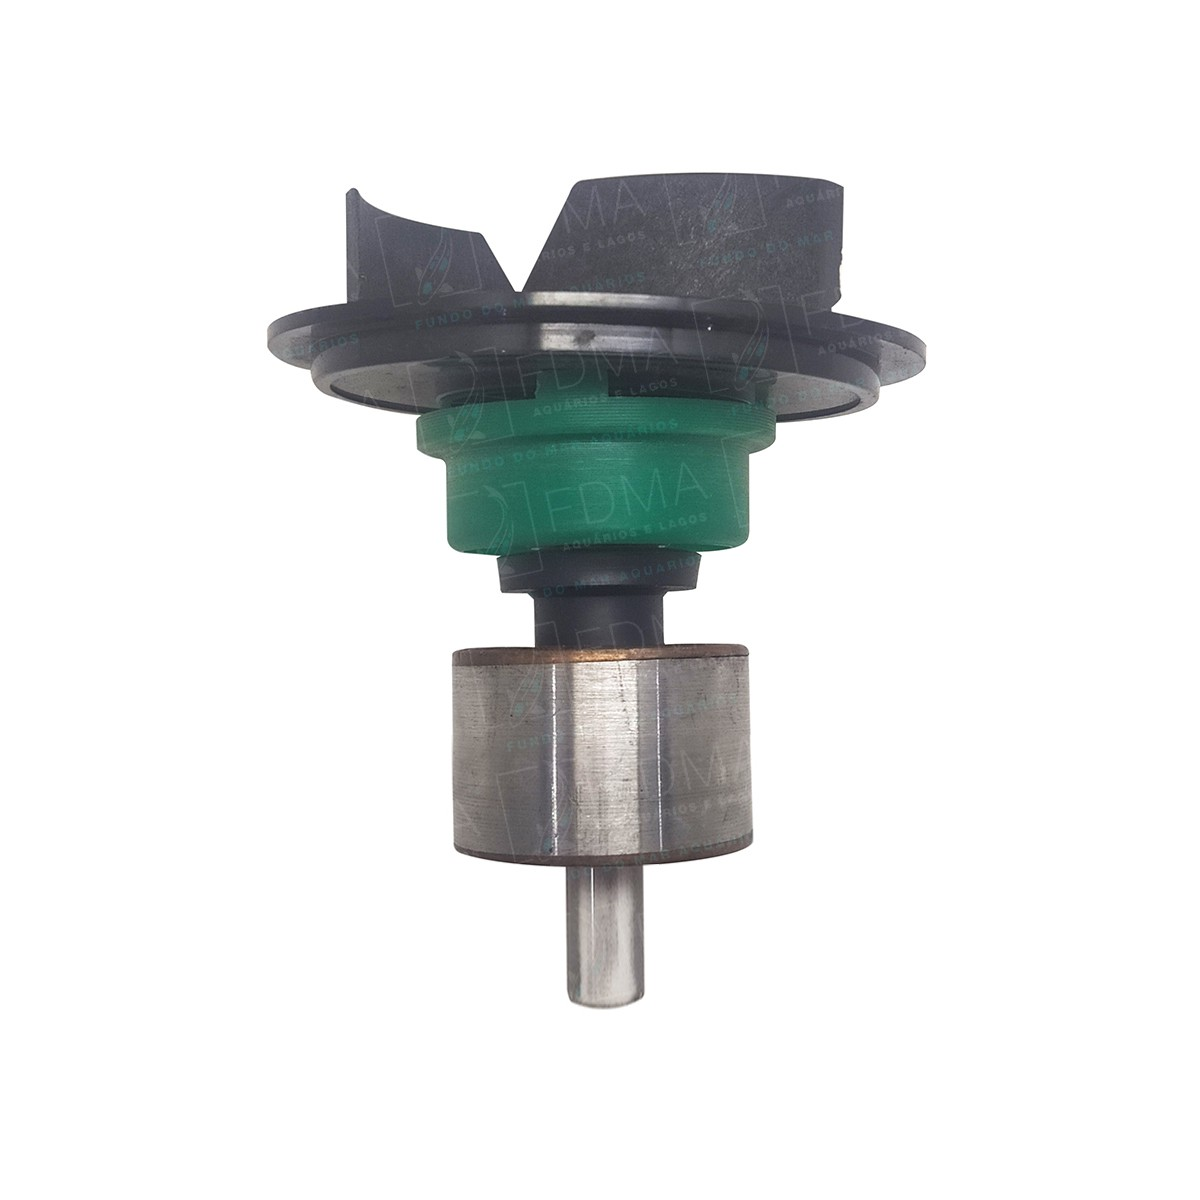 Impeller Rotor para Bombas SUNSUN - JEP 5000